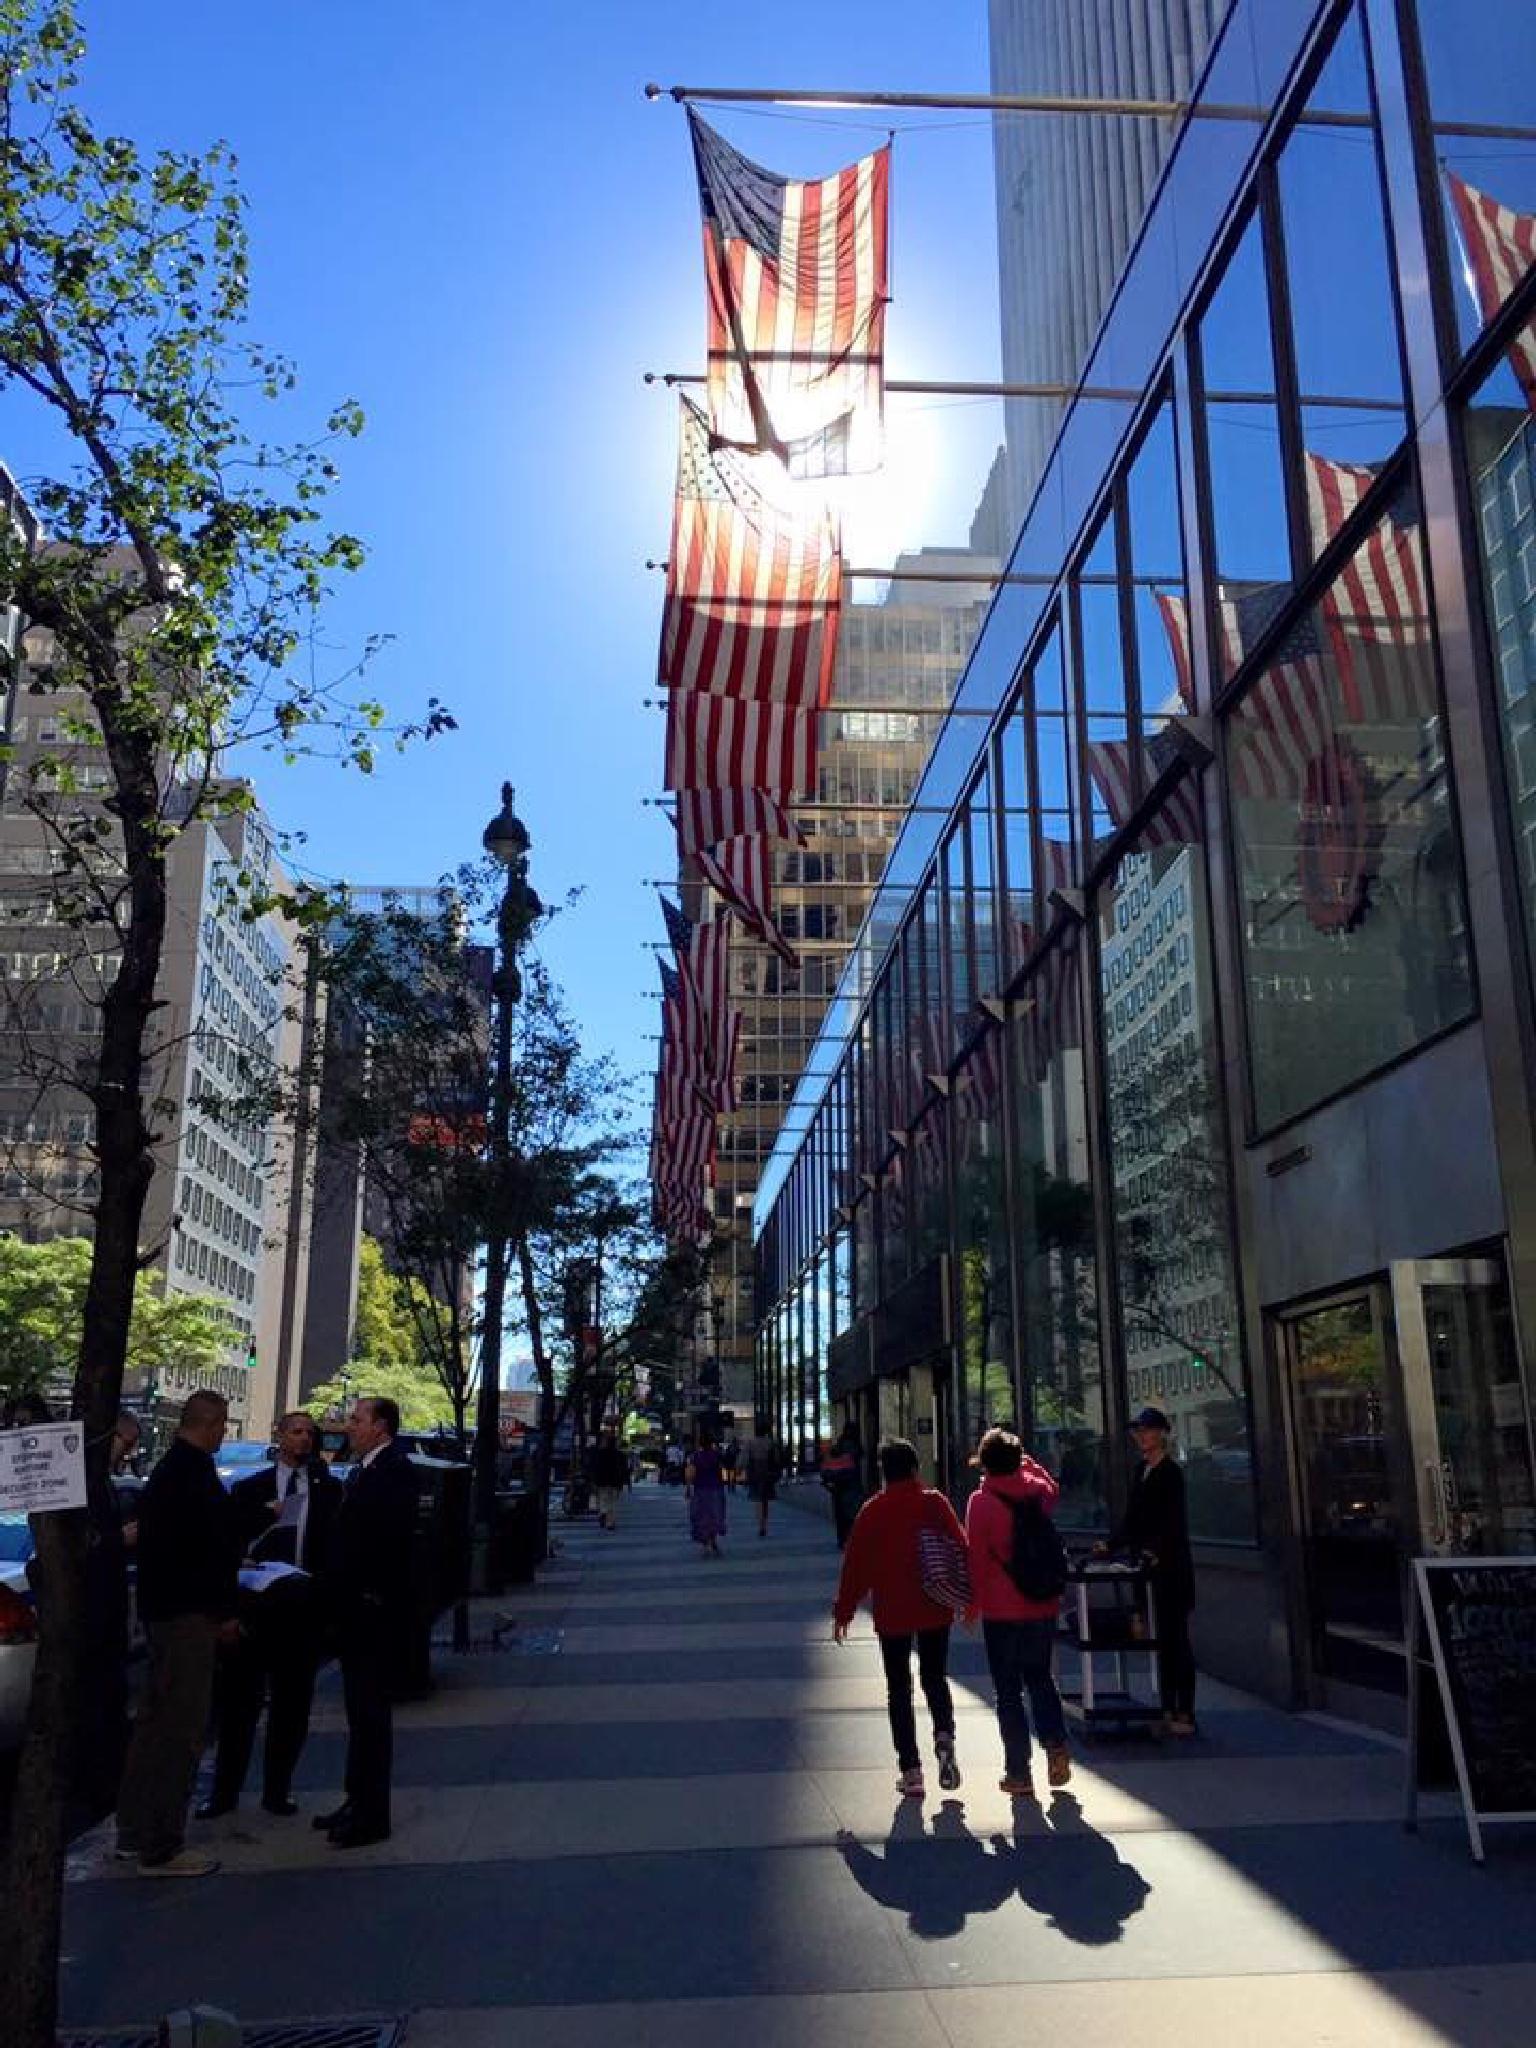 Walking upstreet by Cheentz